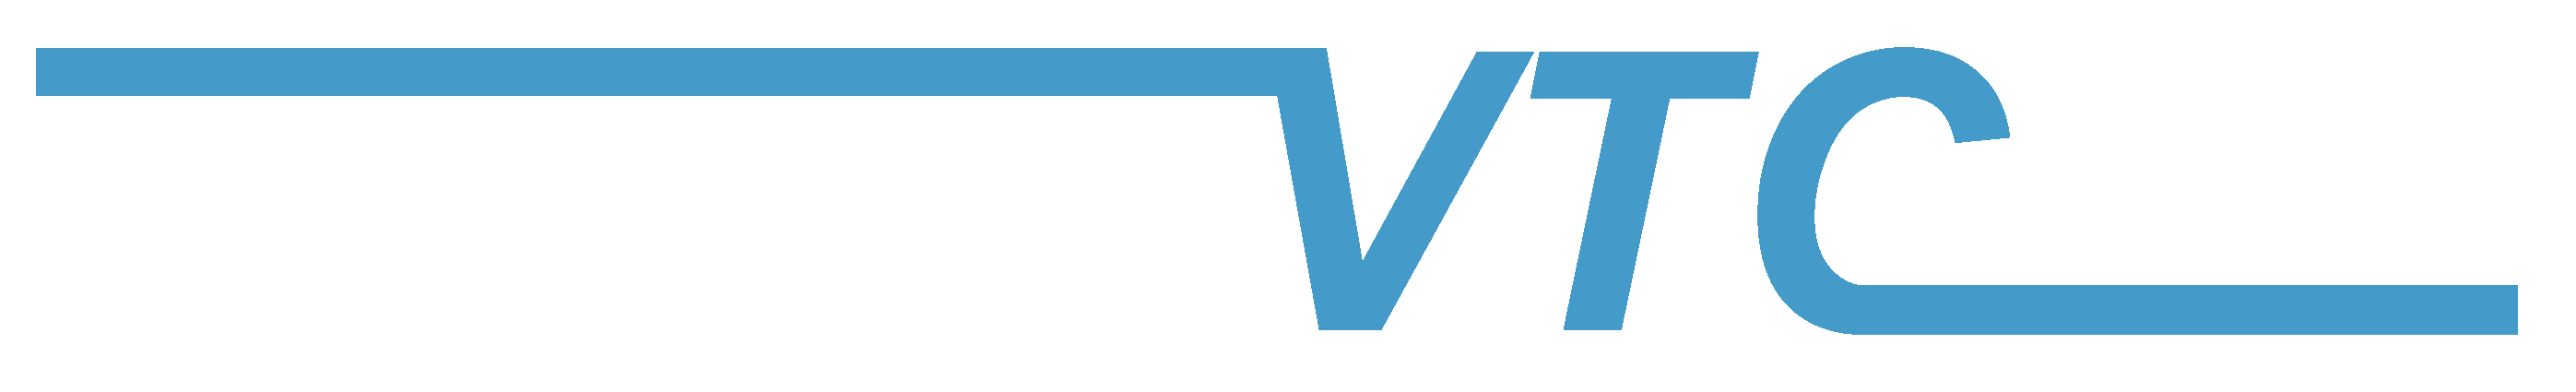 VTC Côte-d'Azur - Chauffeur VTC à Nice